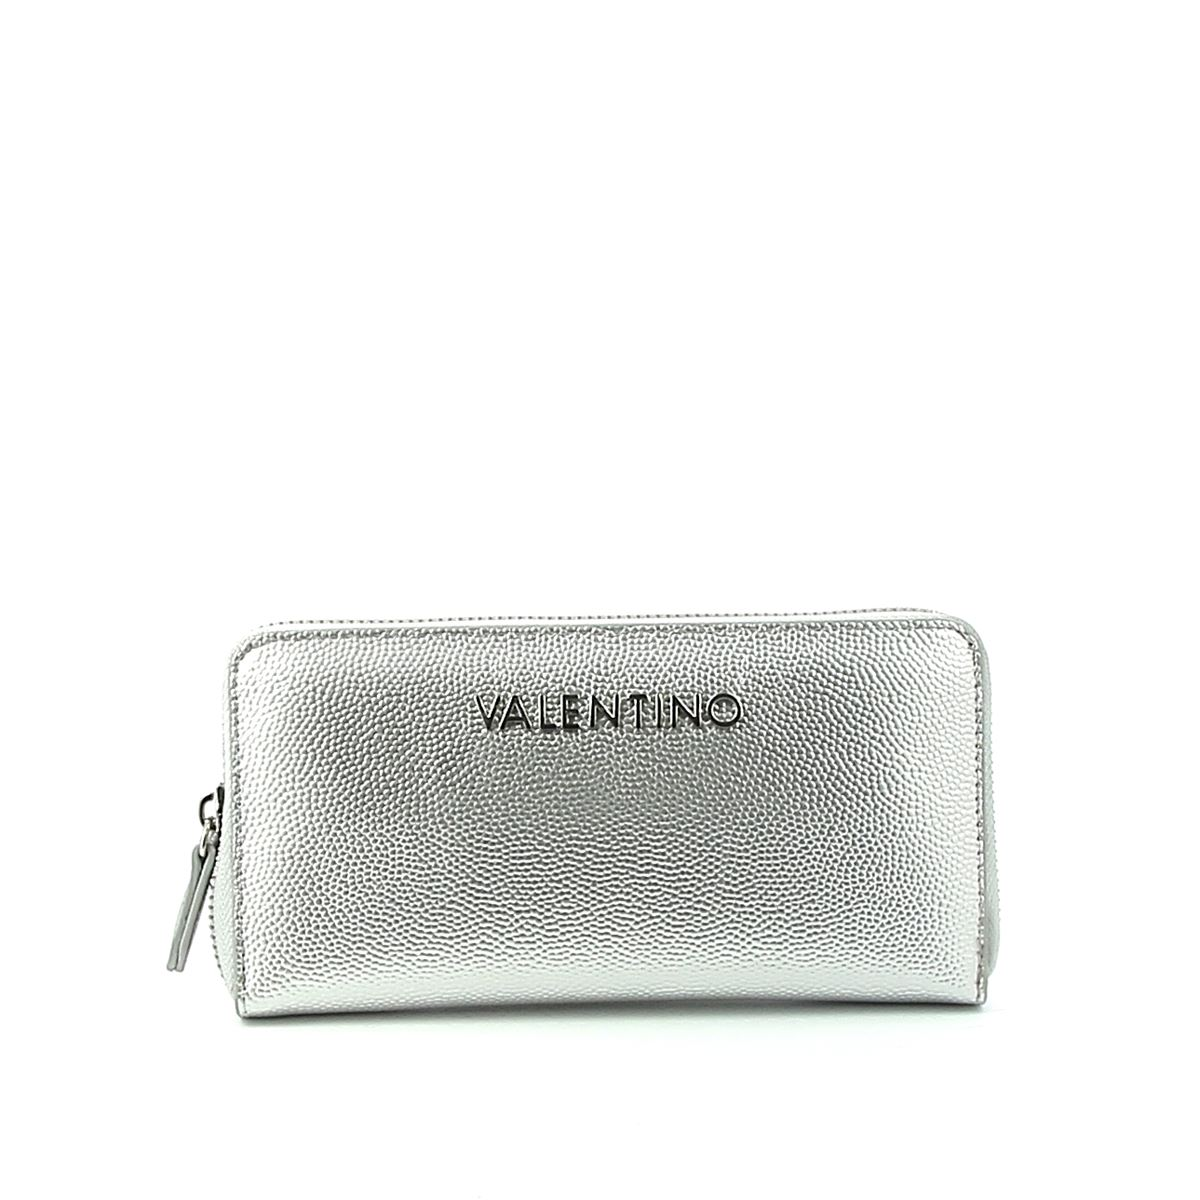 Valentino Wallet Femme Divina R4155G